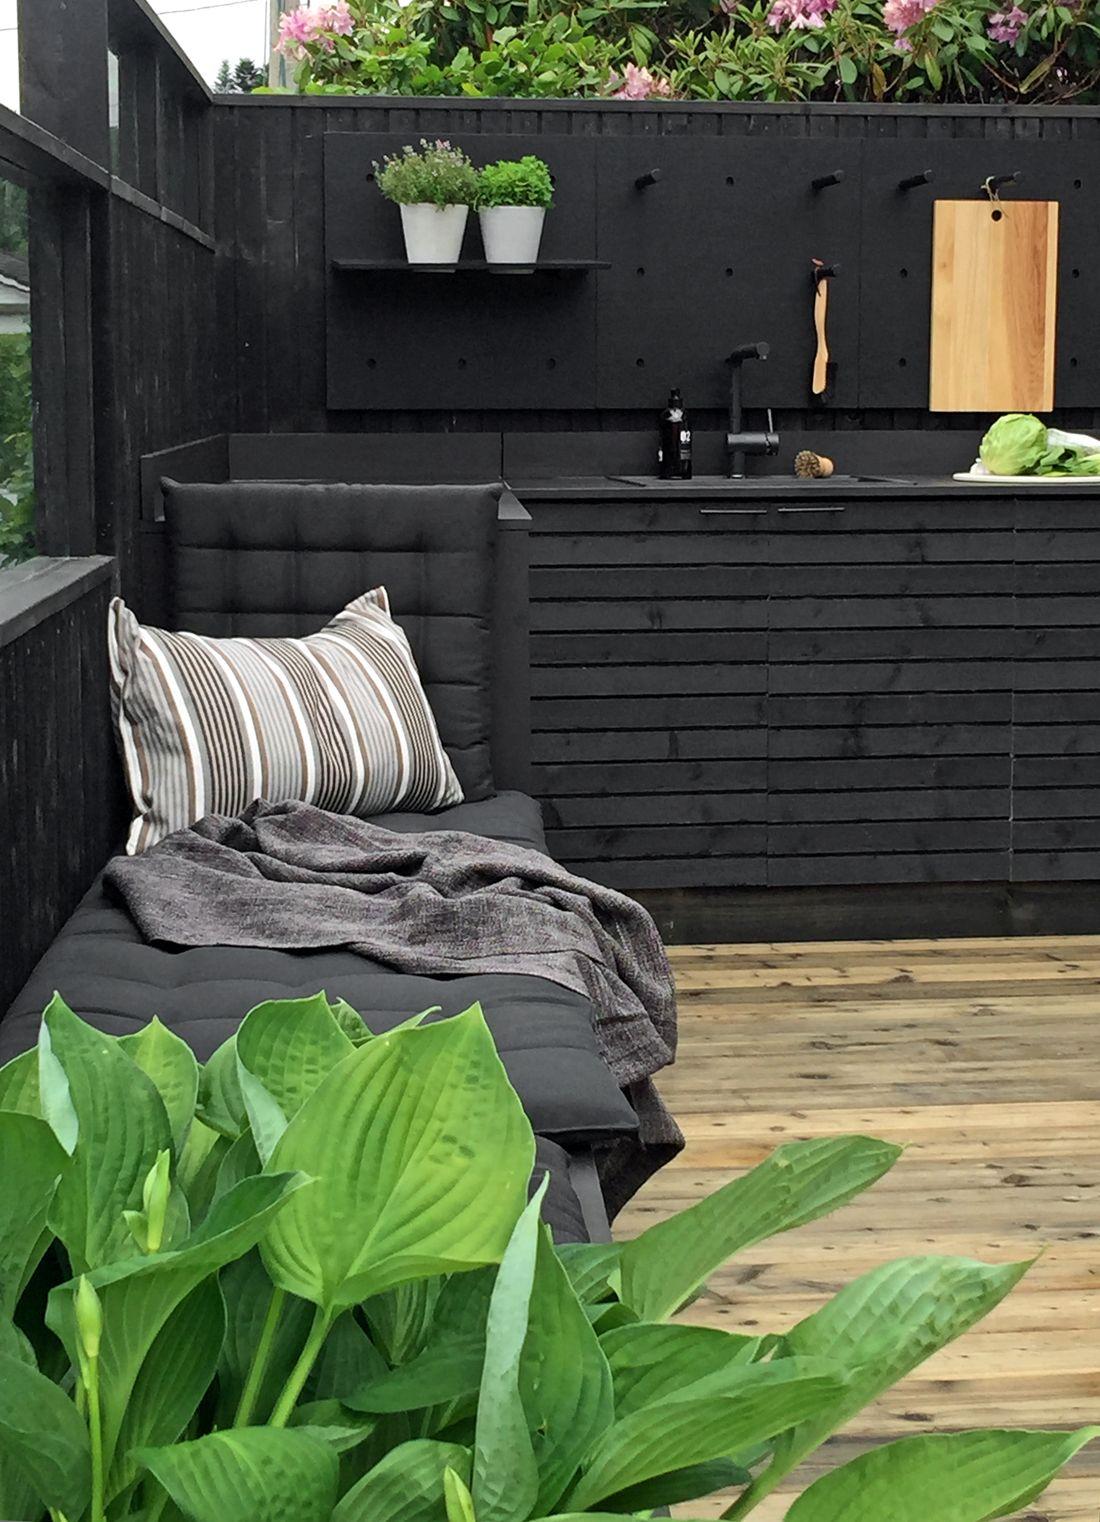 therese knutsen tv garden design at tv2 puutarha garden garten garten ideen garten k che. Black Bedroom Furniture Sets. Home Design Ideas